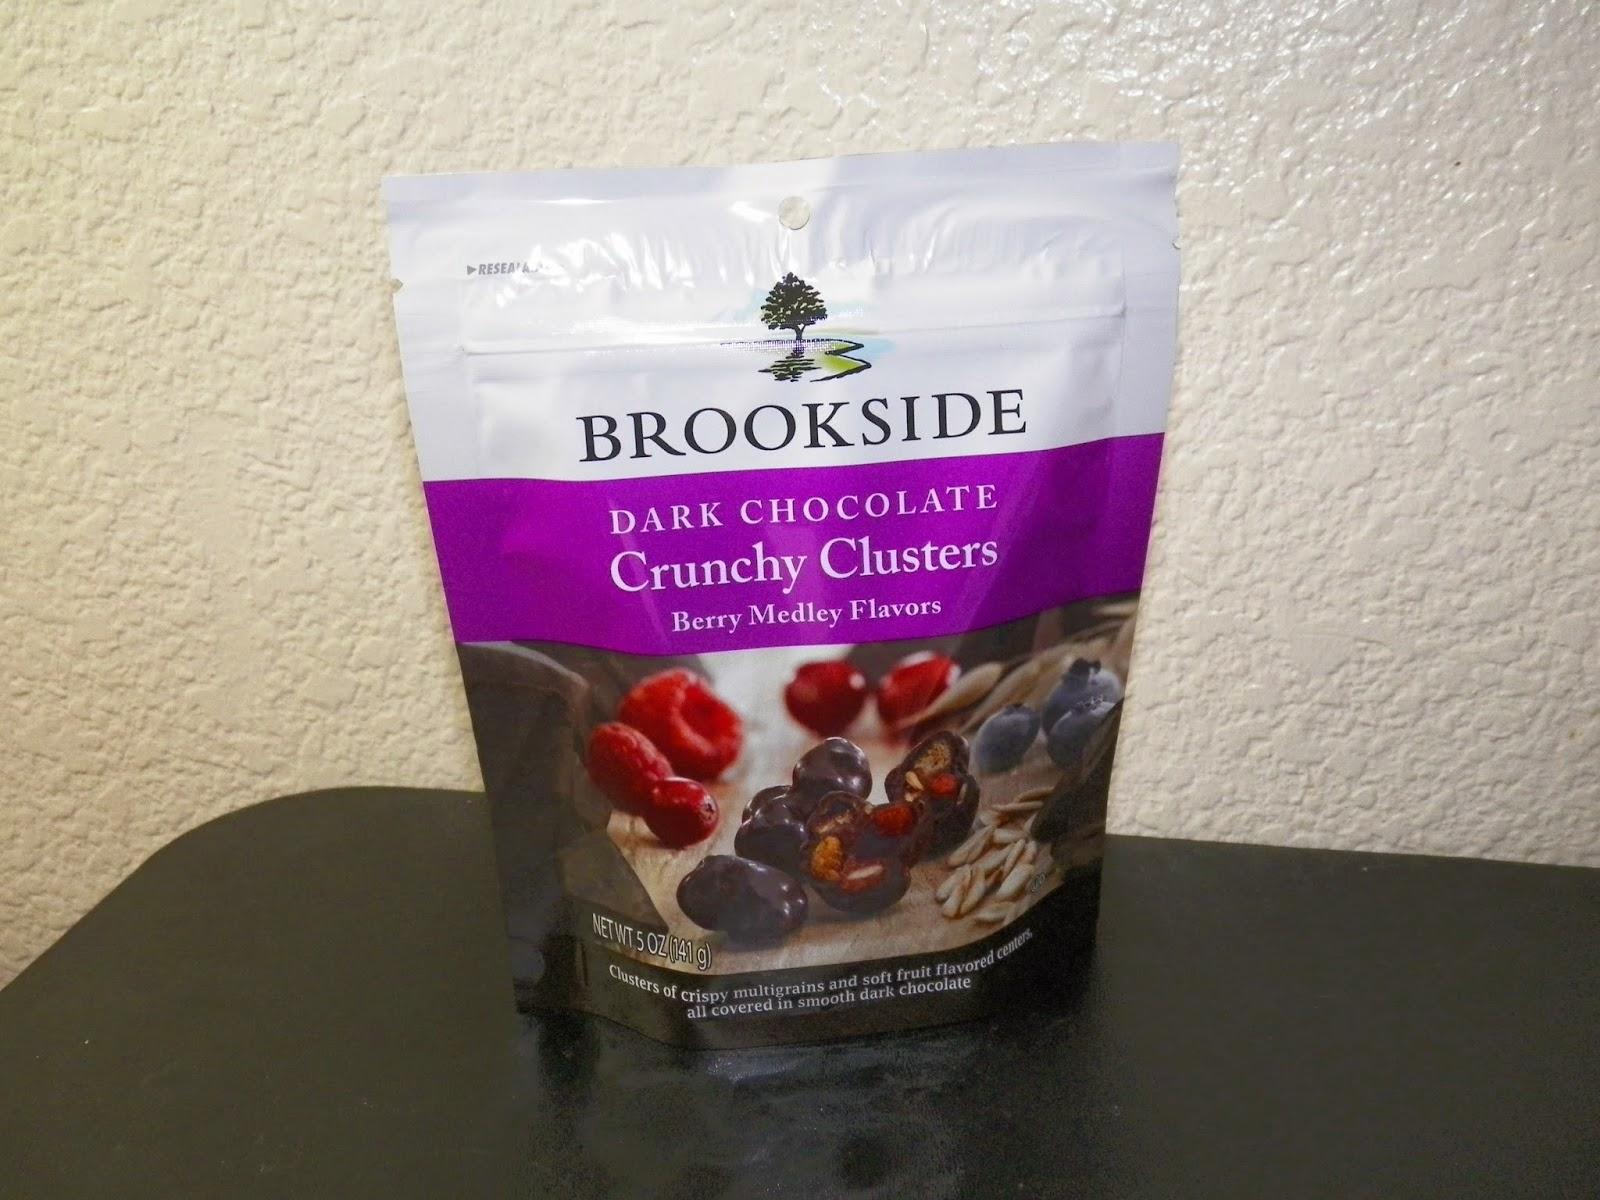 BrooksideDarkChocolateCrunchyClusters.jpg